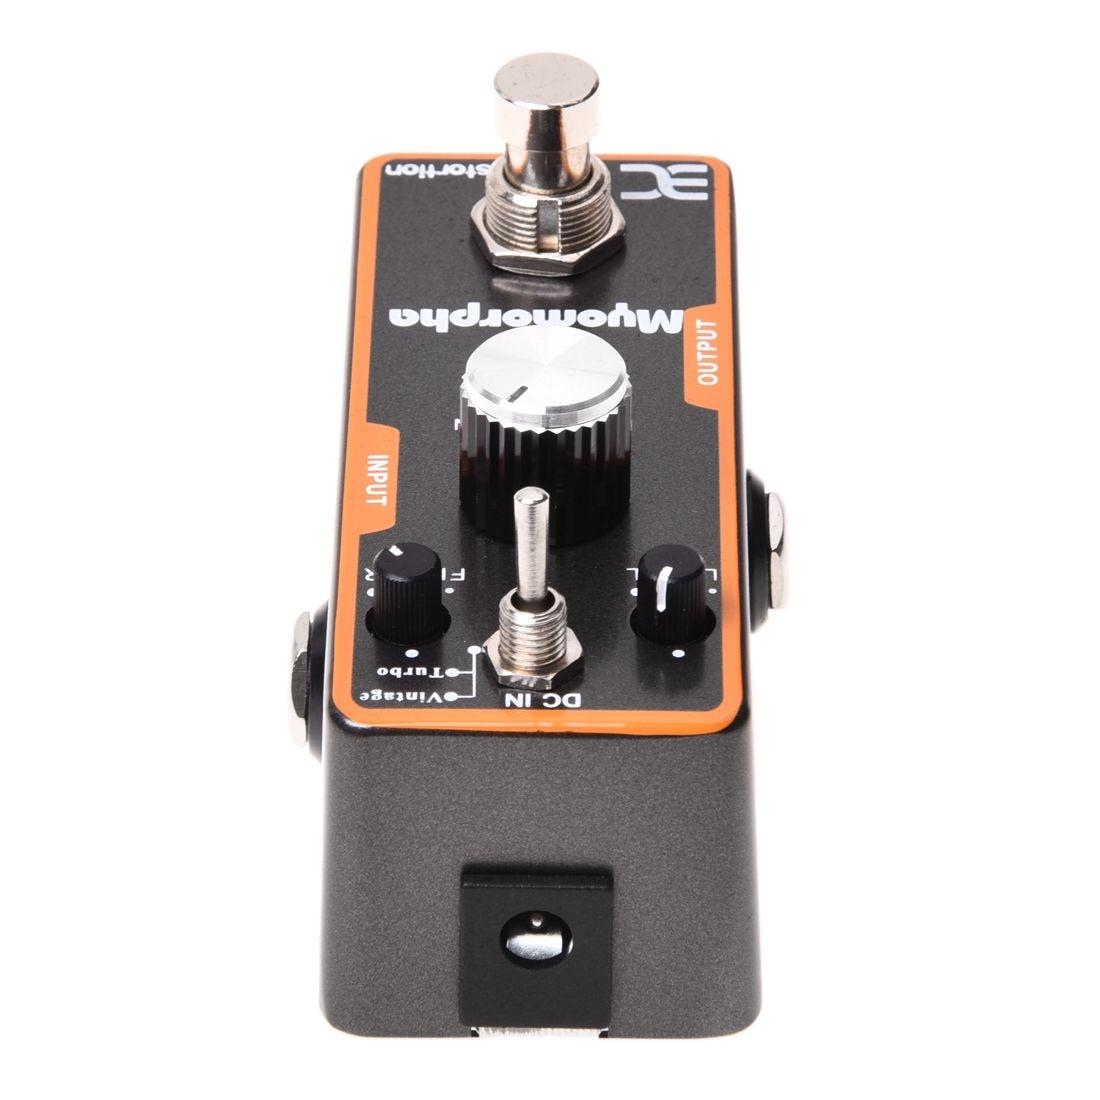 SALES 5xENO TC-13 Music Distortion Mini Pedal Myomorpha True Bypass плиткорез кратон tc 13